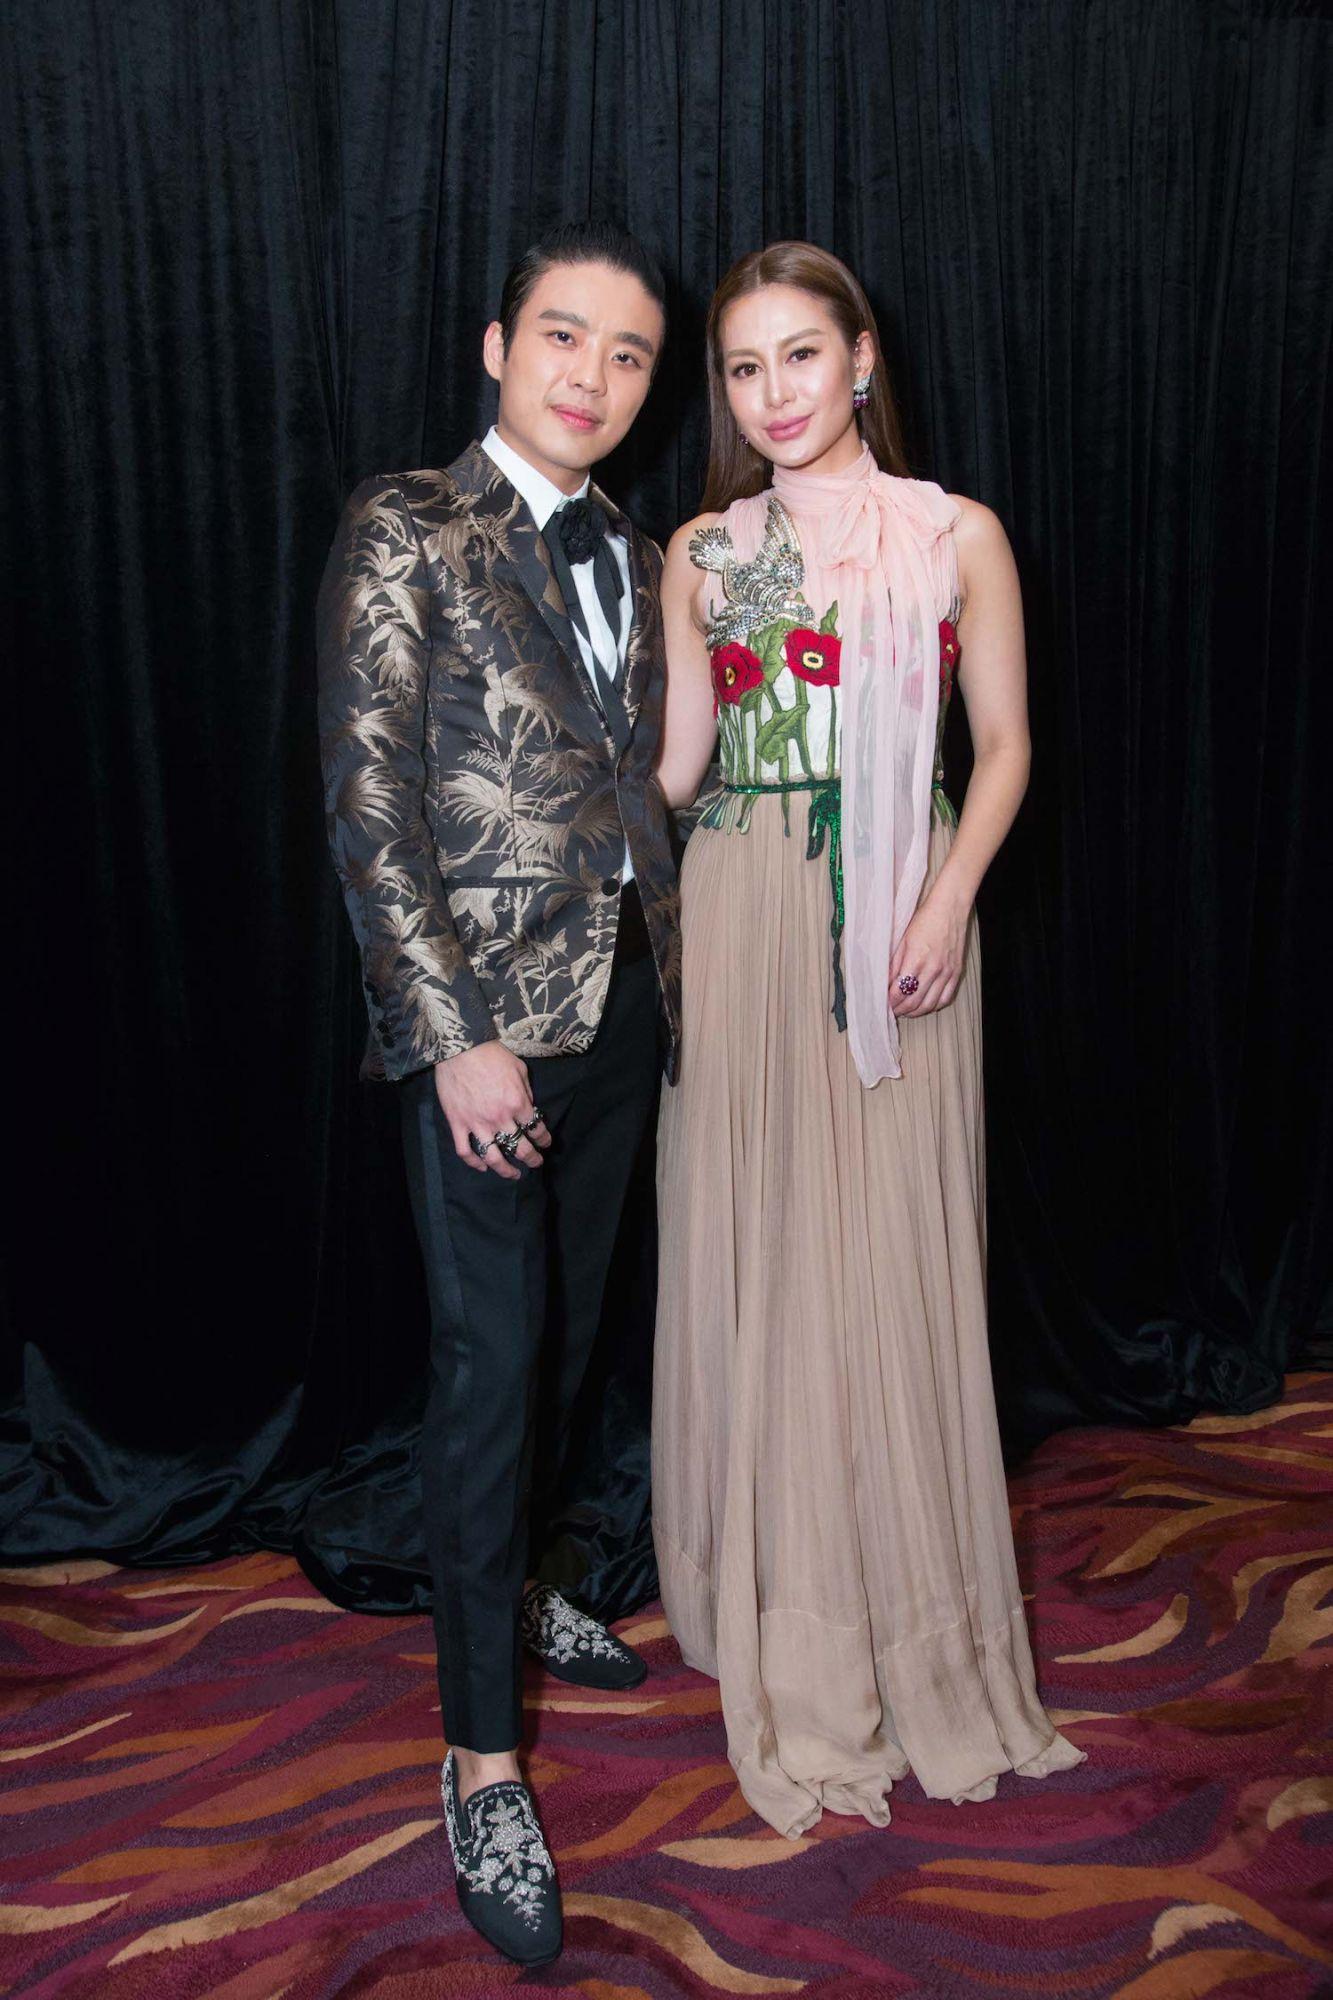 Jonathan Cheung and Eleanor Lam